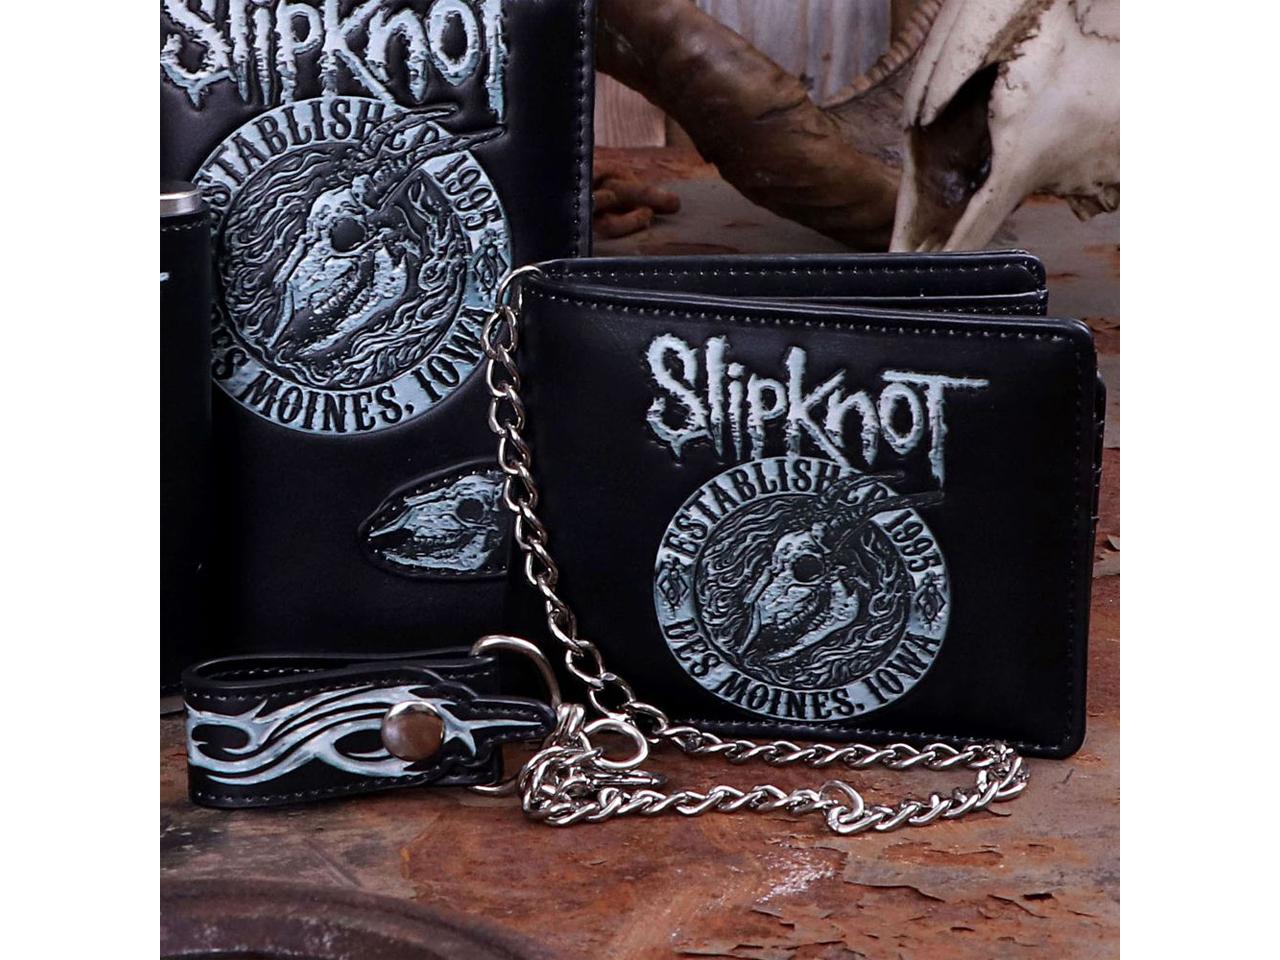 Slipknot Flaming Goat Iconic Band Wallet Chain Merch Music Rock Metal Emo